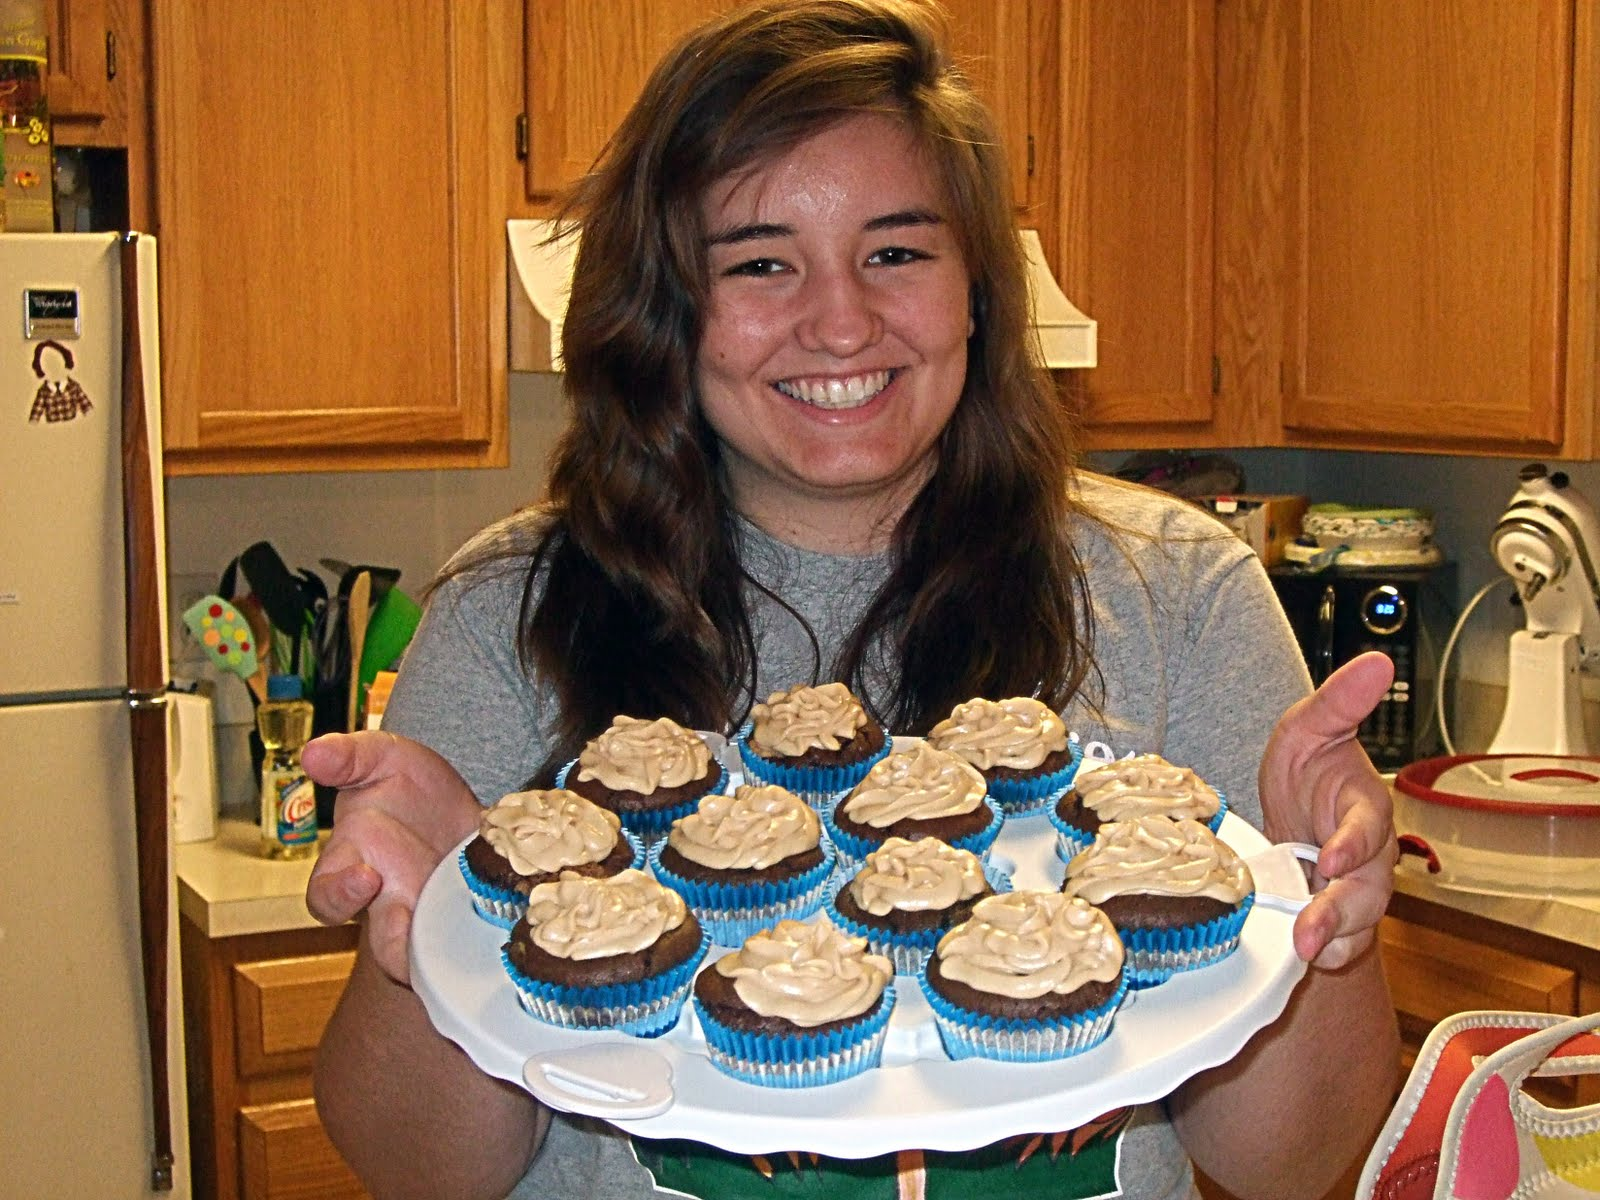 http://1.bp.blogspot.com/_Q0lsqWbF5js/TIWNcXqA2lI/AAAAAAAAAeI/6H_peMgCyDs/s1600/me%2Bwith%2Bcupcakes.jpg